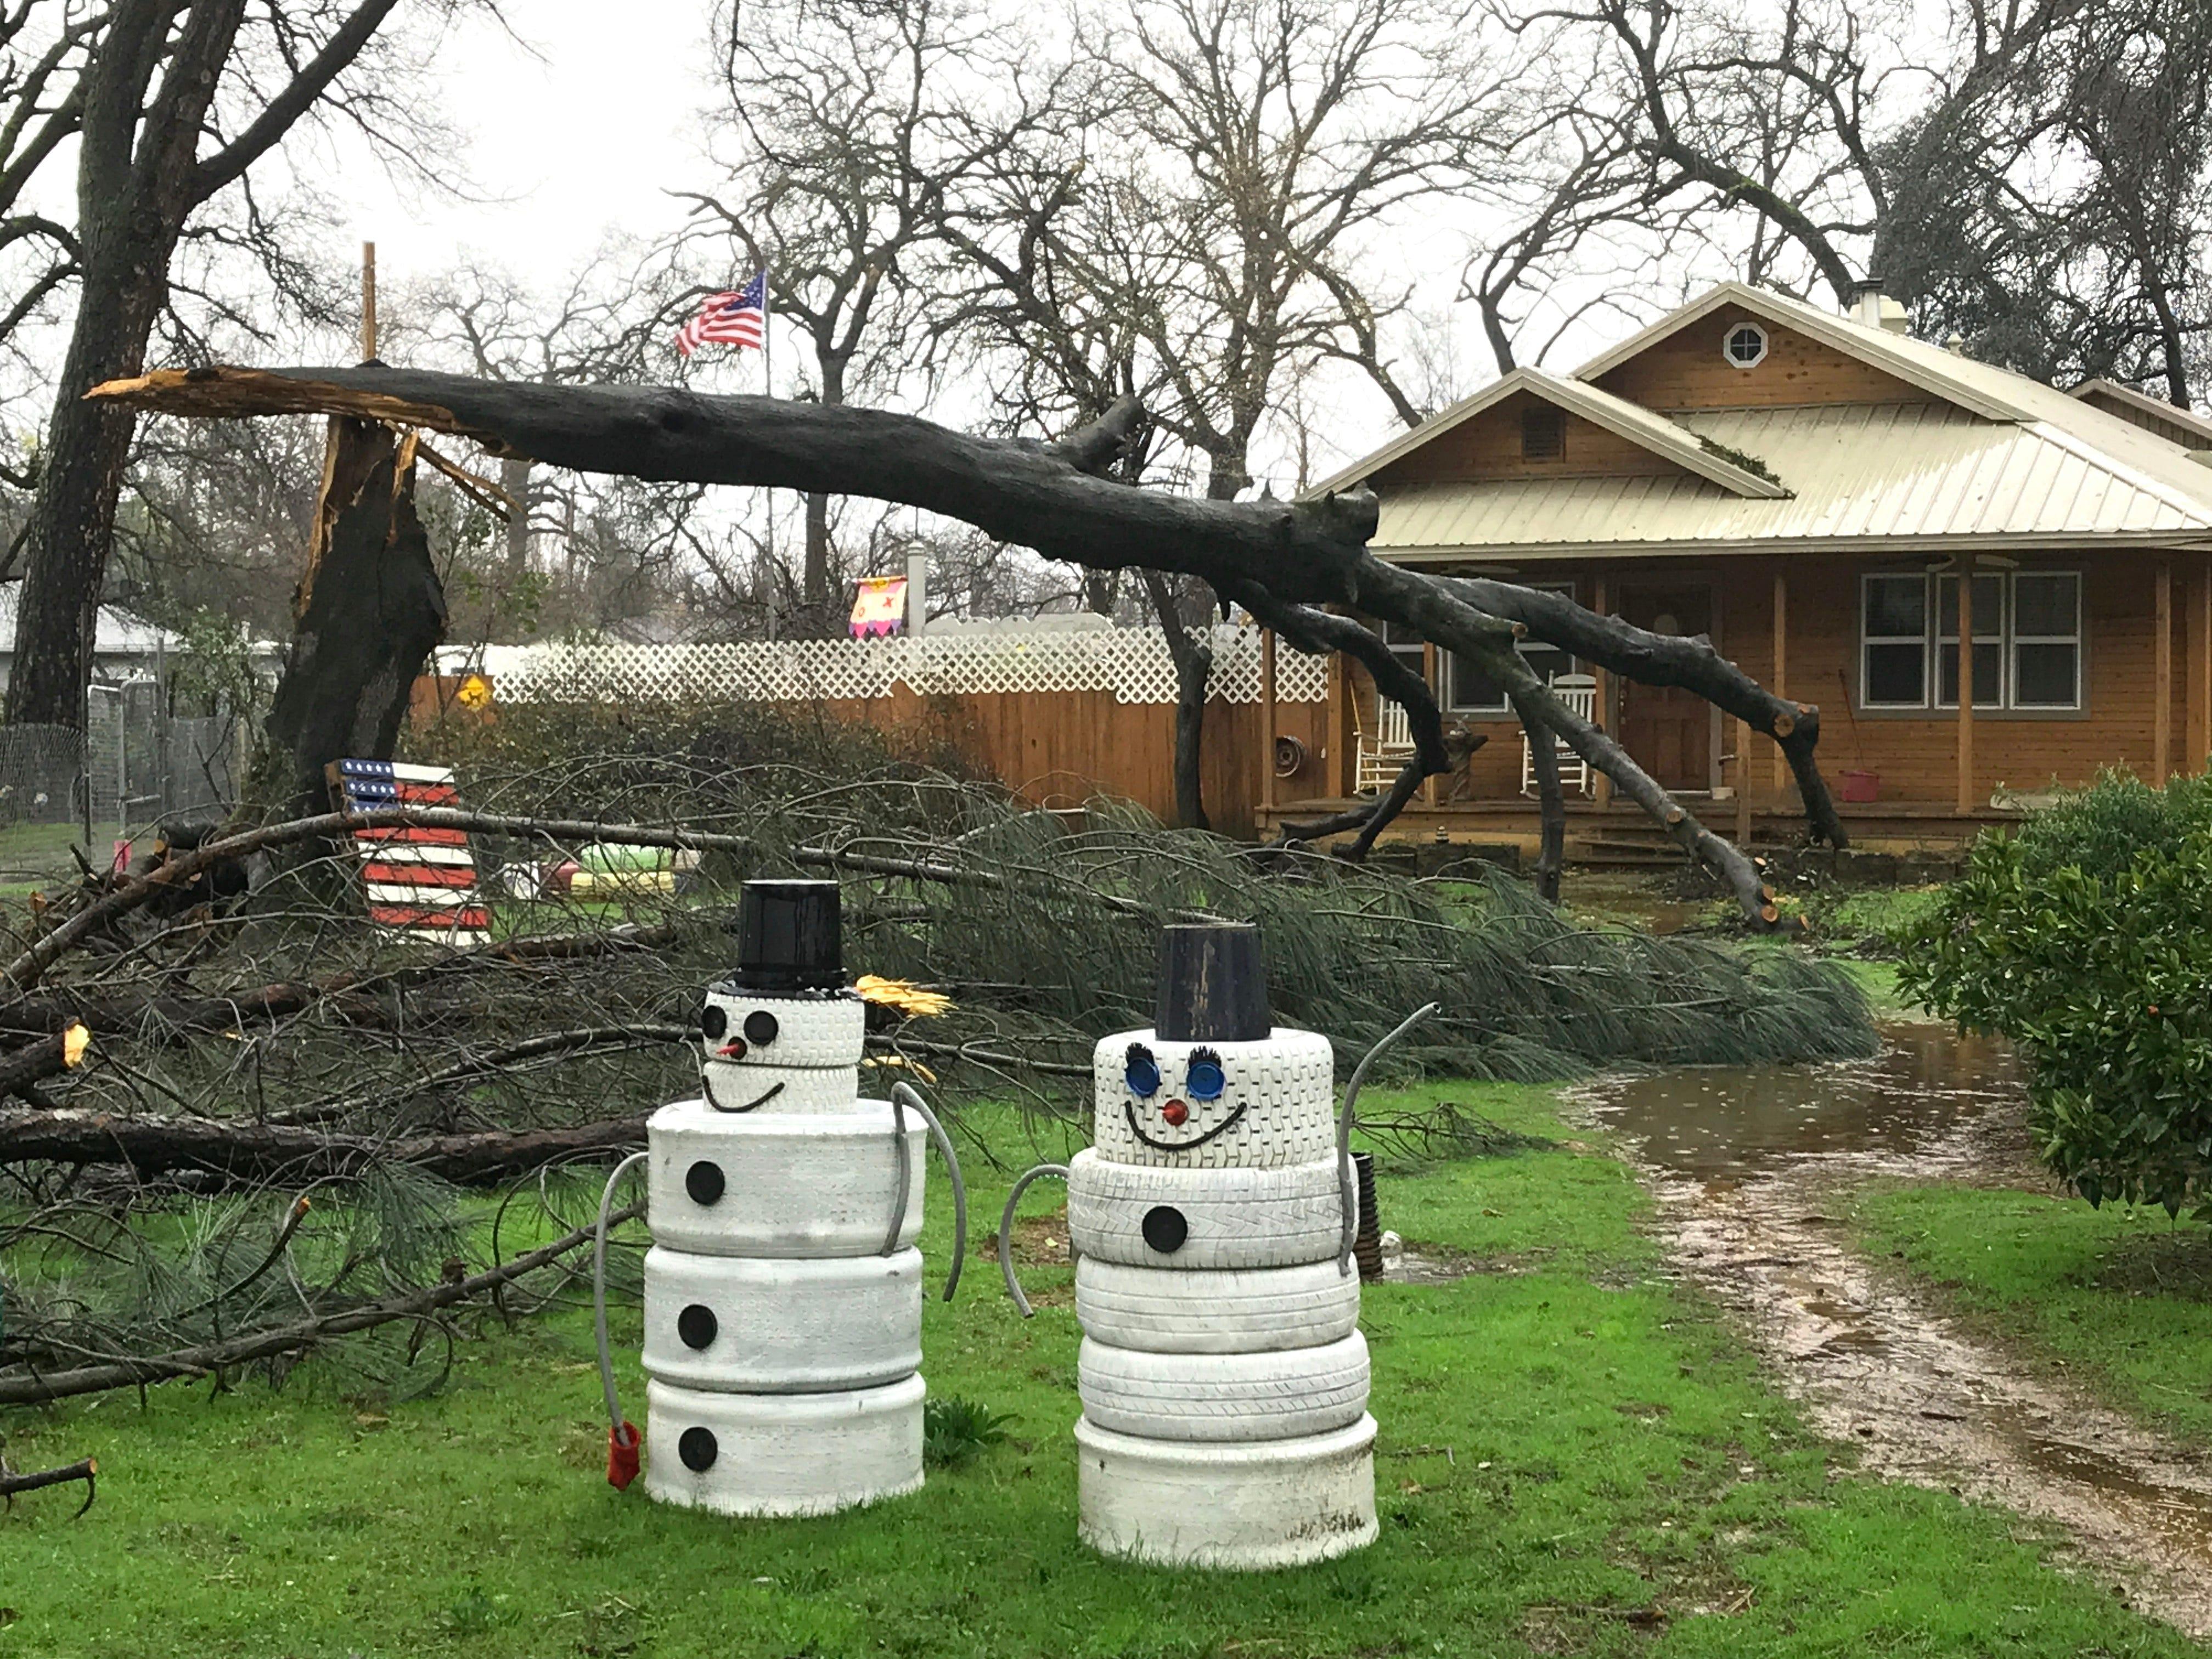 A tree lies sideways Feb. 27, 2019, along Jewell Lane following a February snowstorm that clobbered Redding.